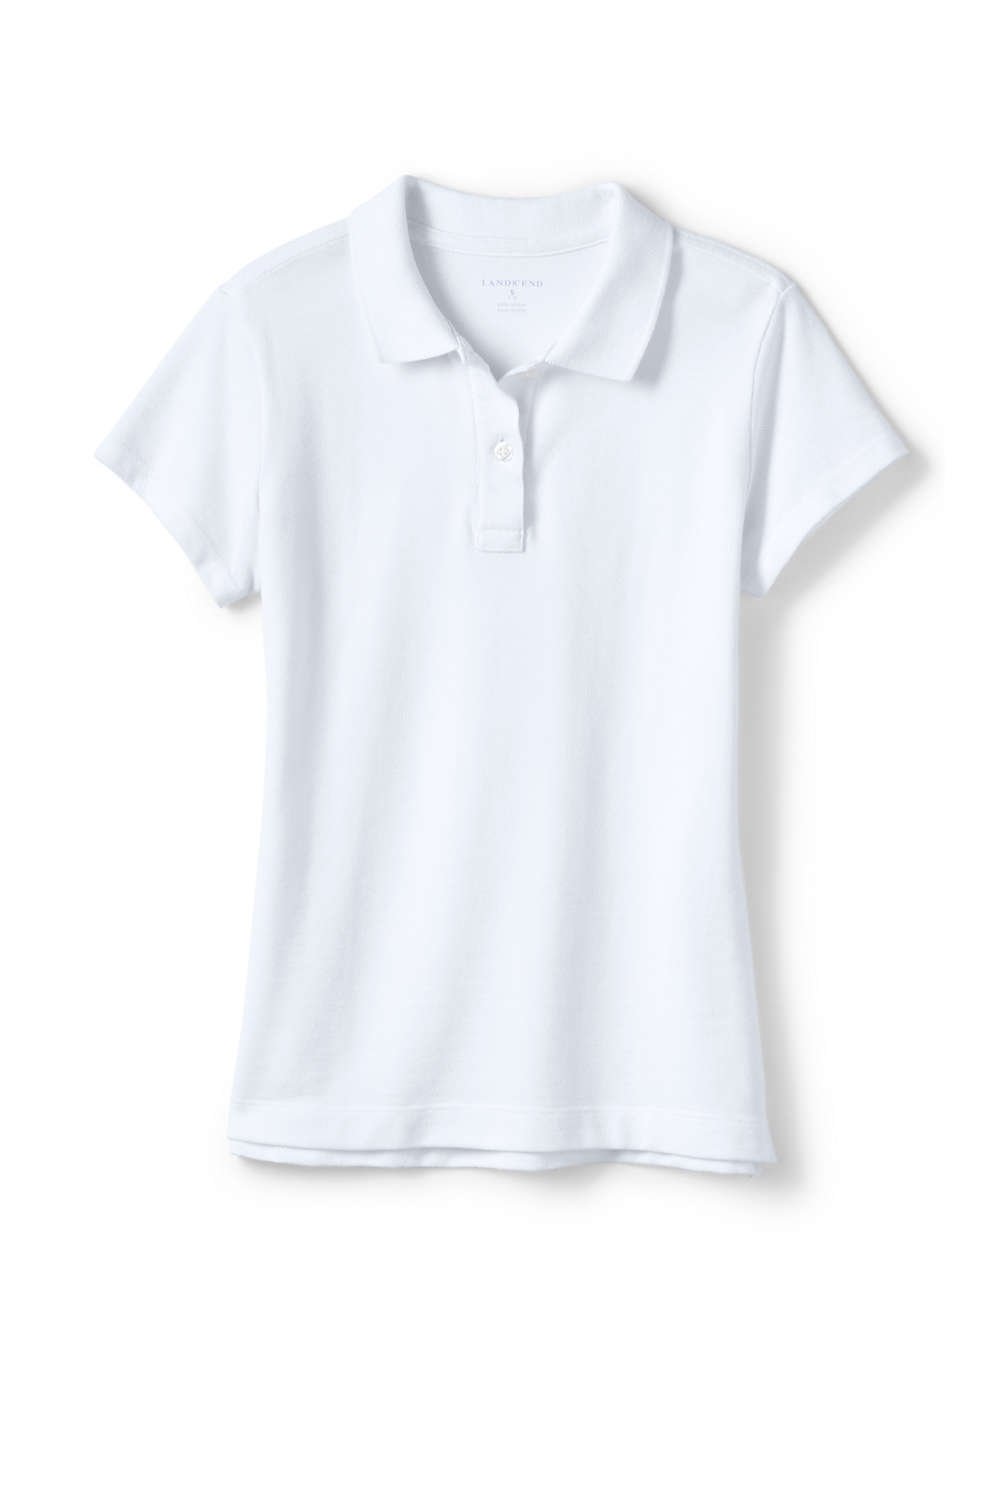 22d8e3a8e School Uniform Fem Fit Short Sleeve Mesh Polo from Lands' End